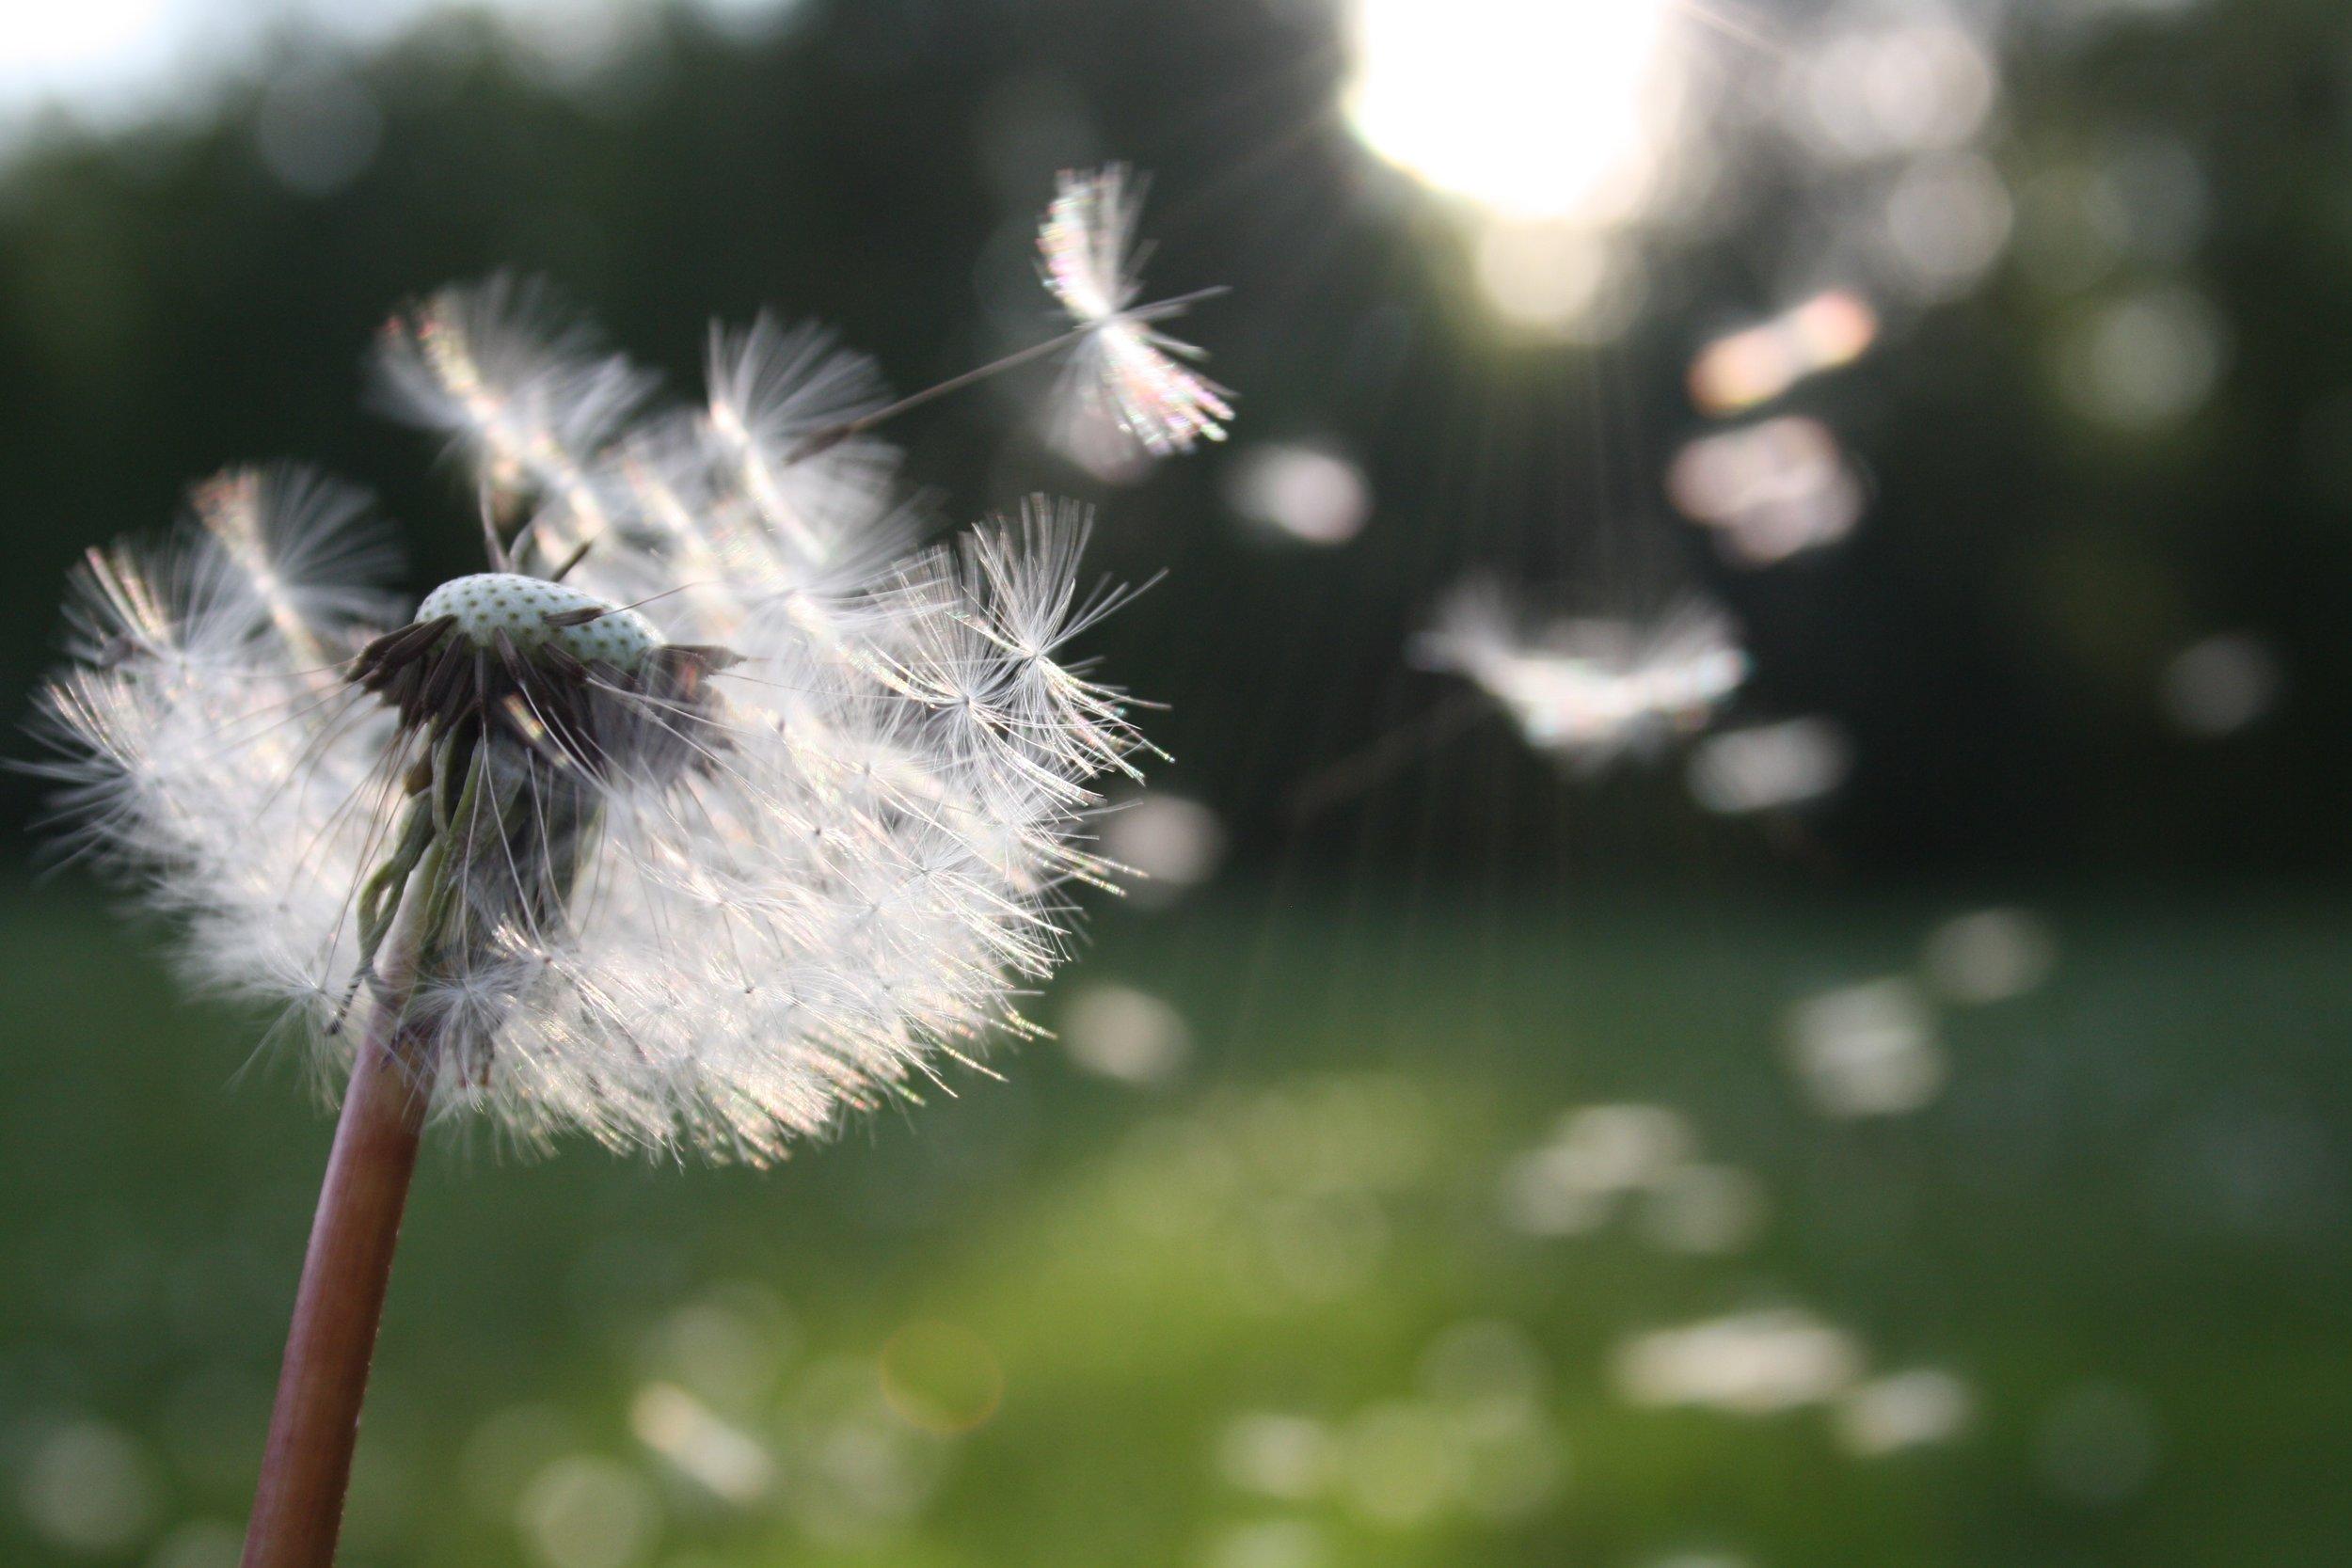 blowball-dandelion-dandelion-seed-54300.jpg